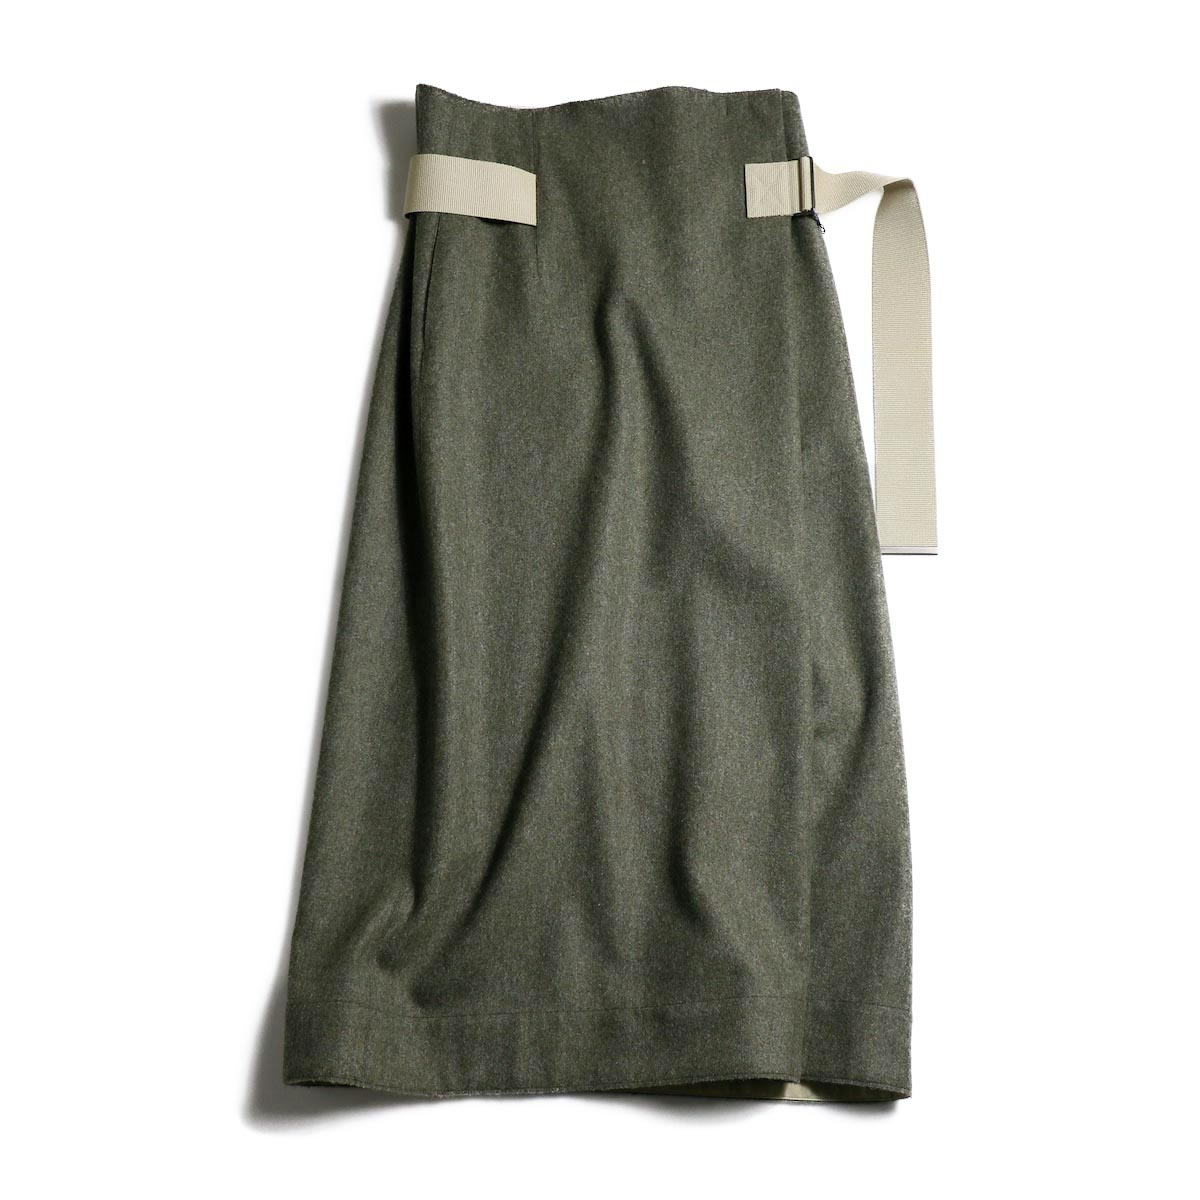 YLEVE / Monotone Tweed CoatYLEVE / Fox Wool Flannel SK -Green